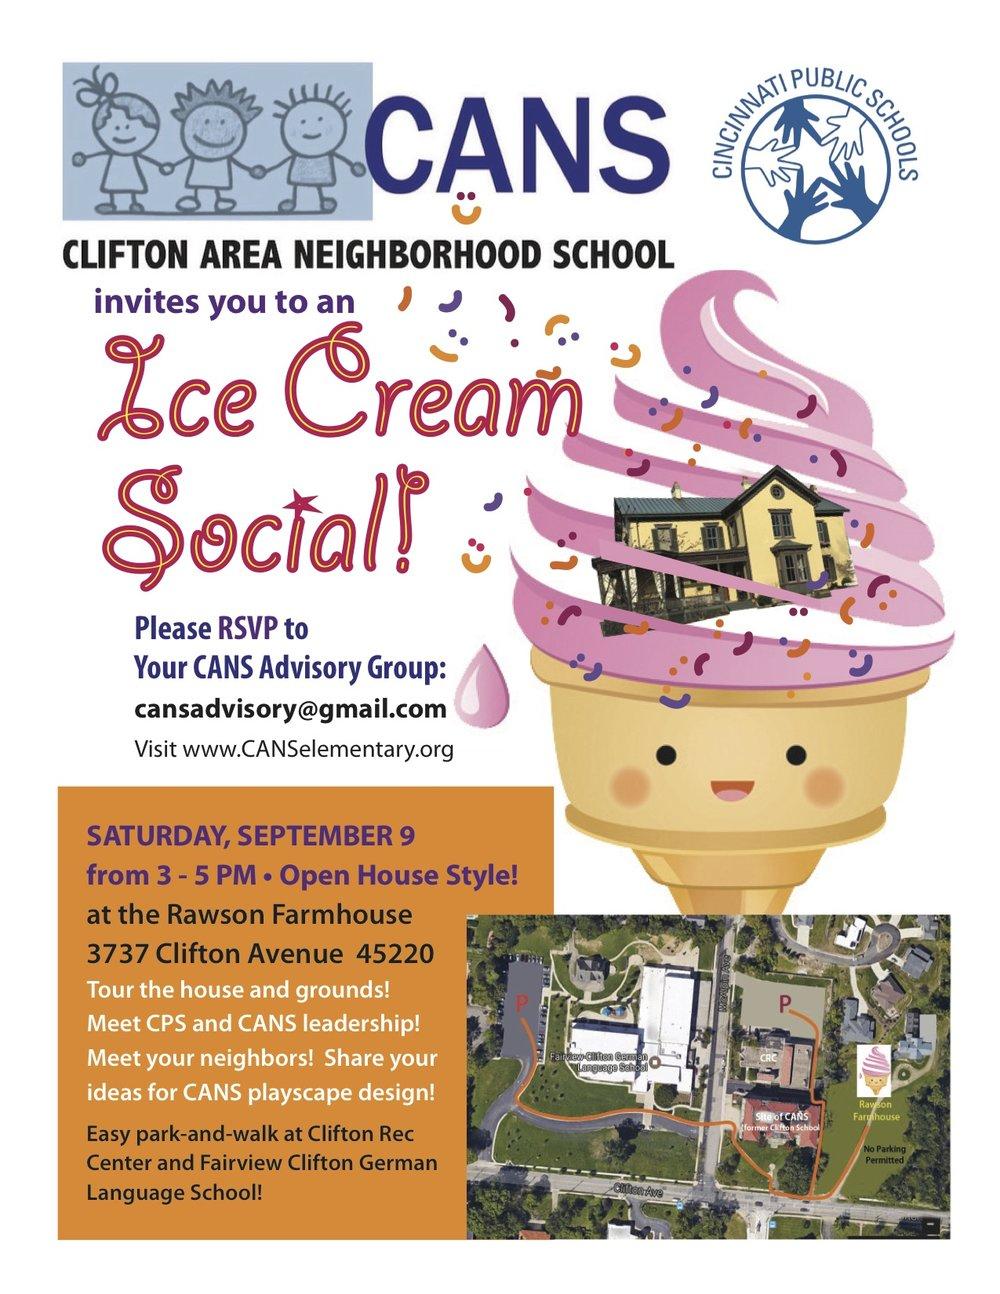 CANS Ice Cream Social invitation.jpg